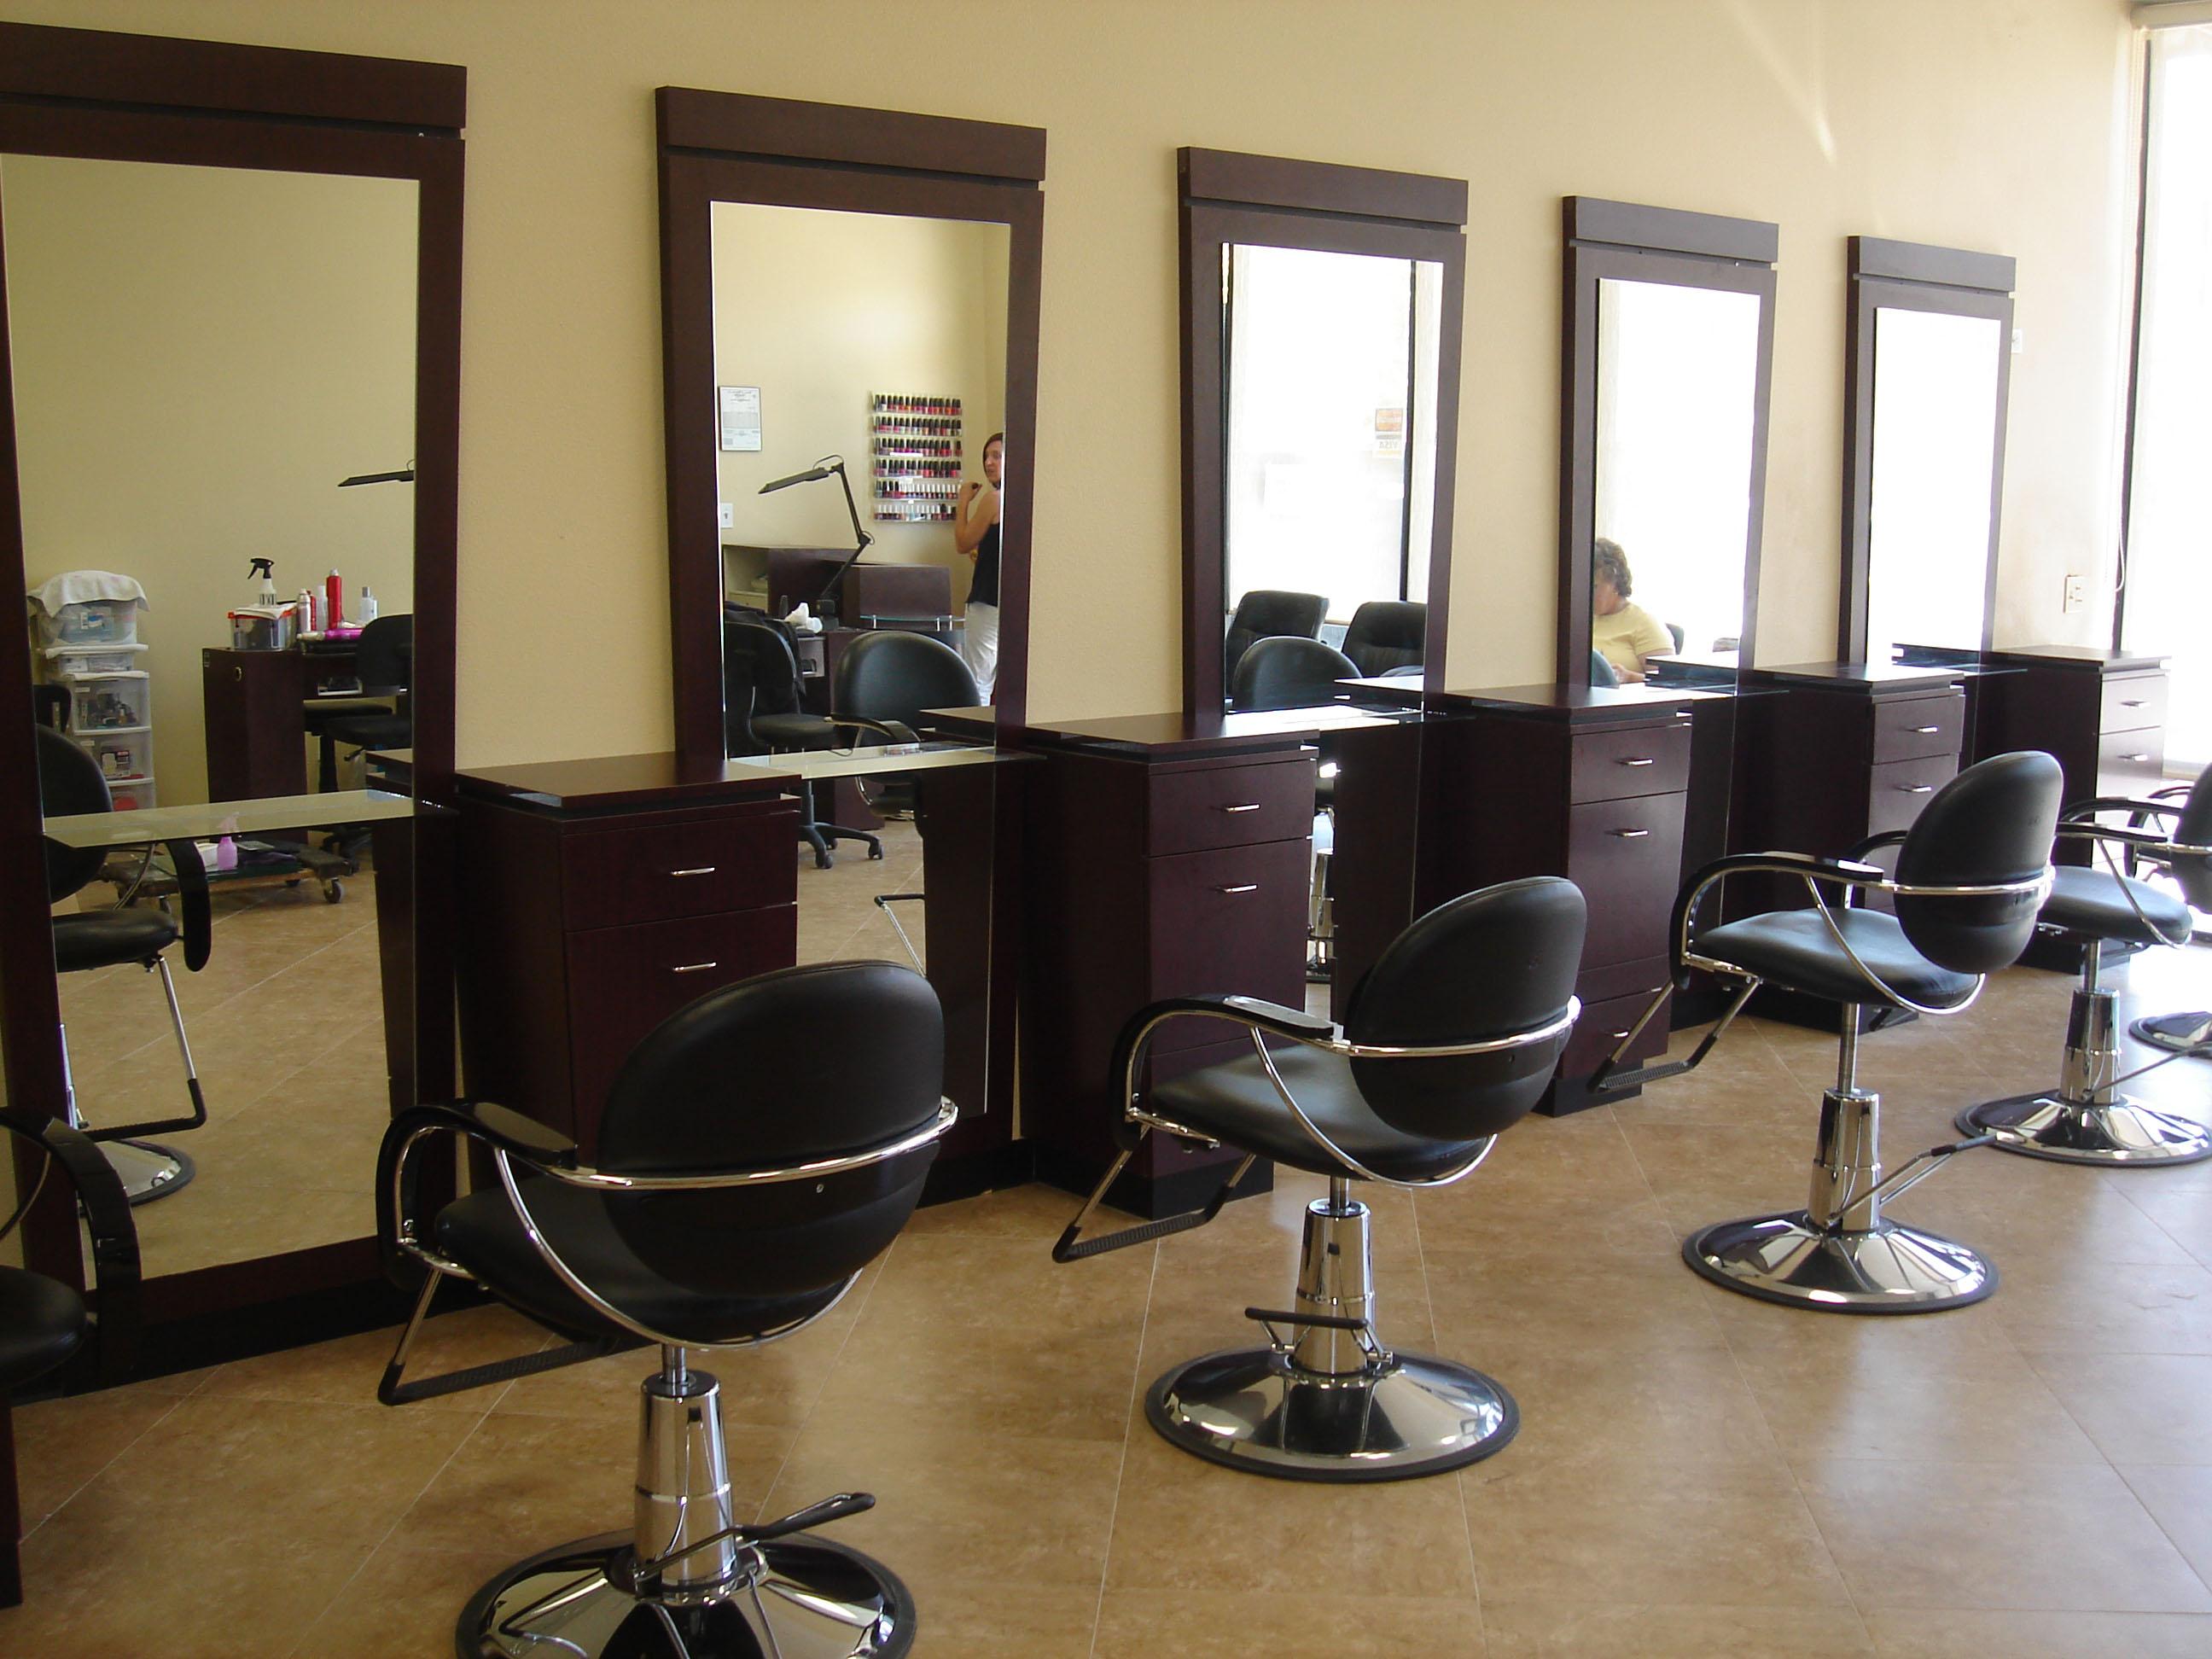 salon furniture complete hair salon 38 bicskpe JMADIVJ